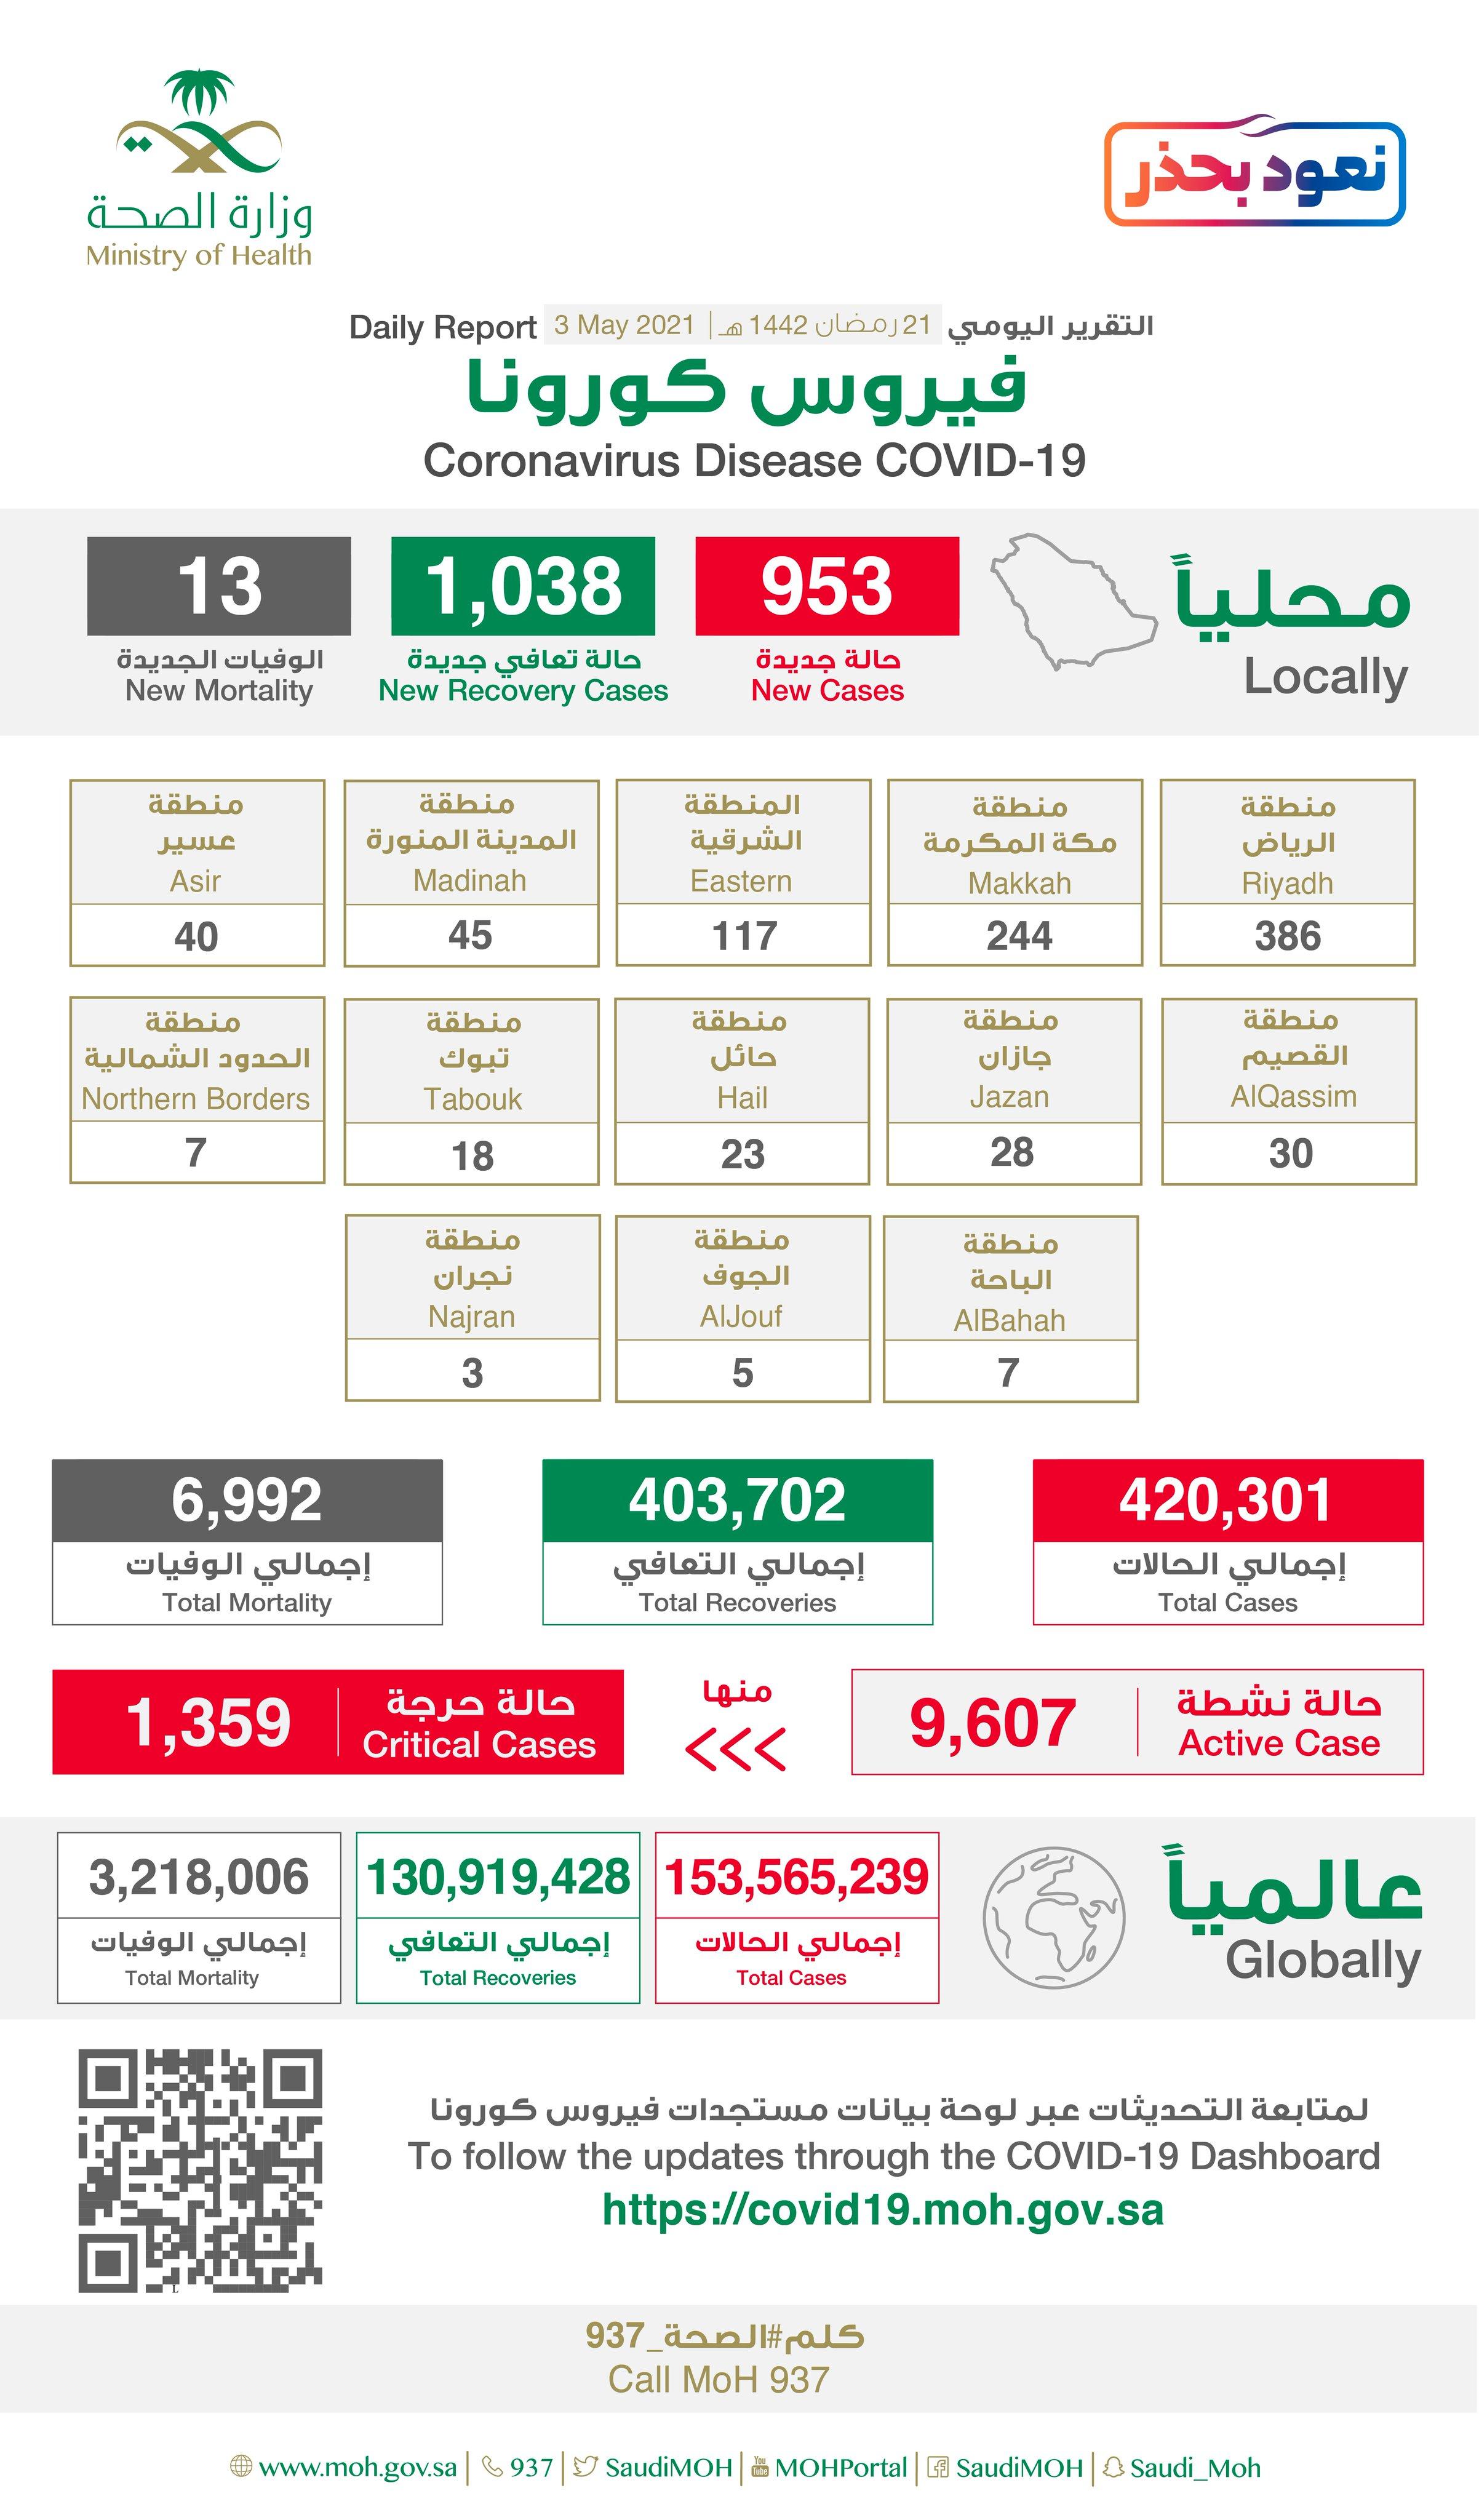 Saudi Arabia Coronavirus : Total Cases :420,301 , New Cases : 953 , Cured : 403,702 , Deaths: 6,992, Active Cases : 9,607